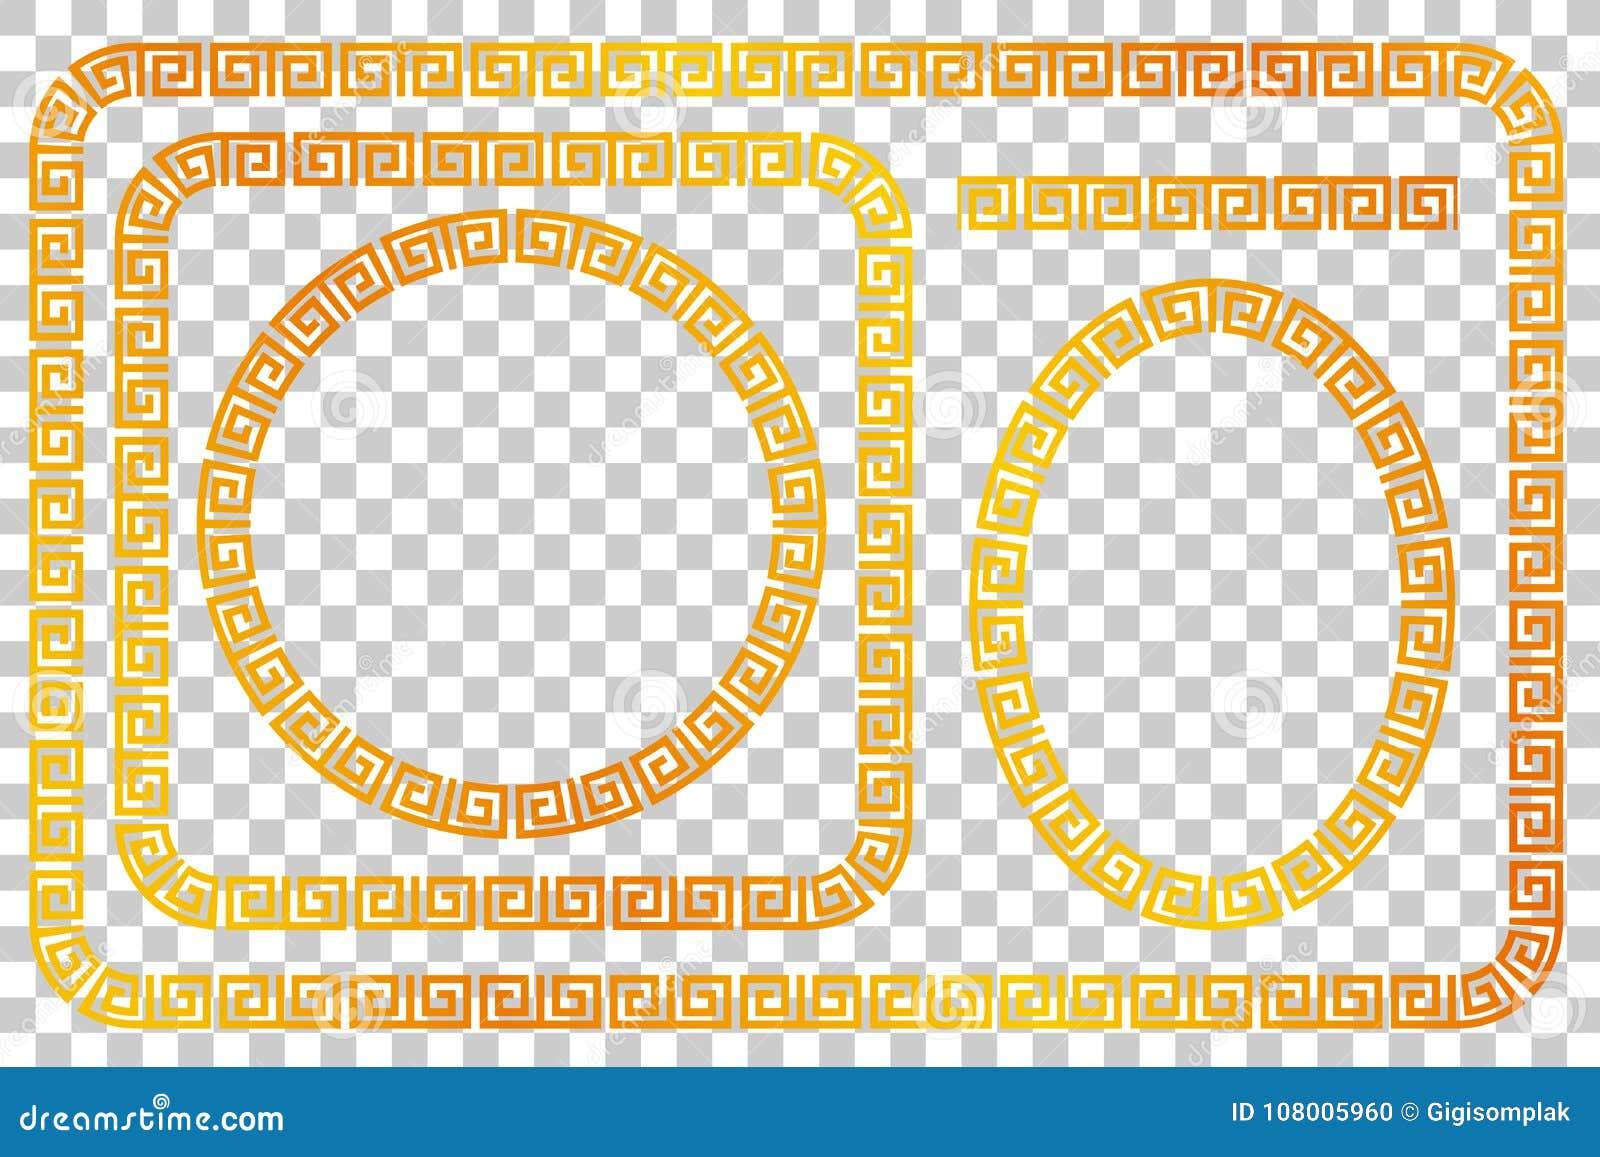 Seamless Golden Frame For Certificate, Placard Go Xi Fat Cai / Imlek ...